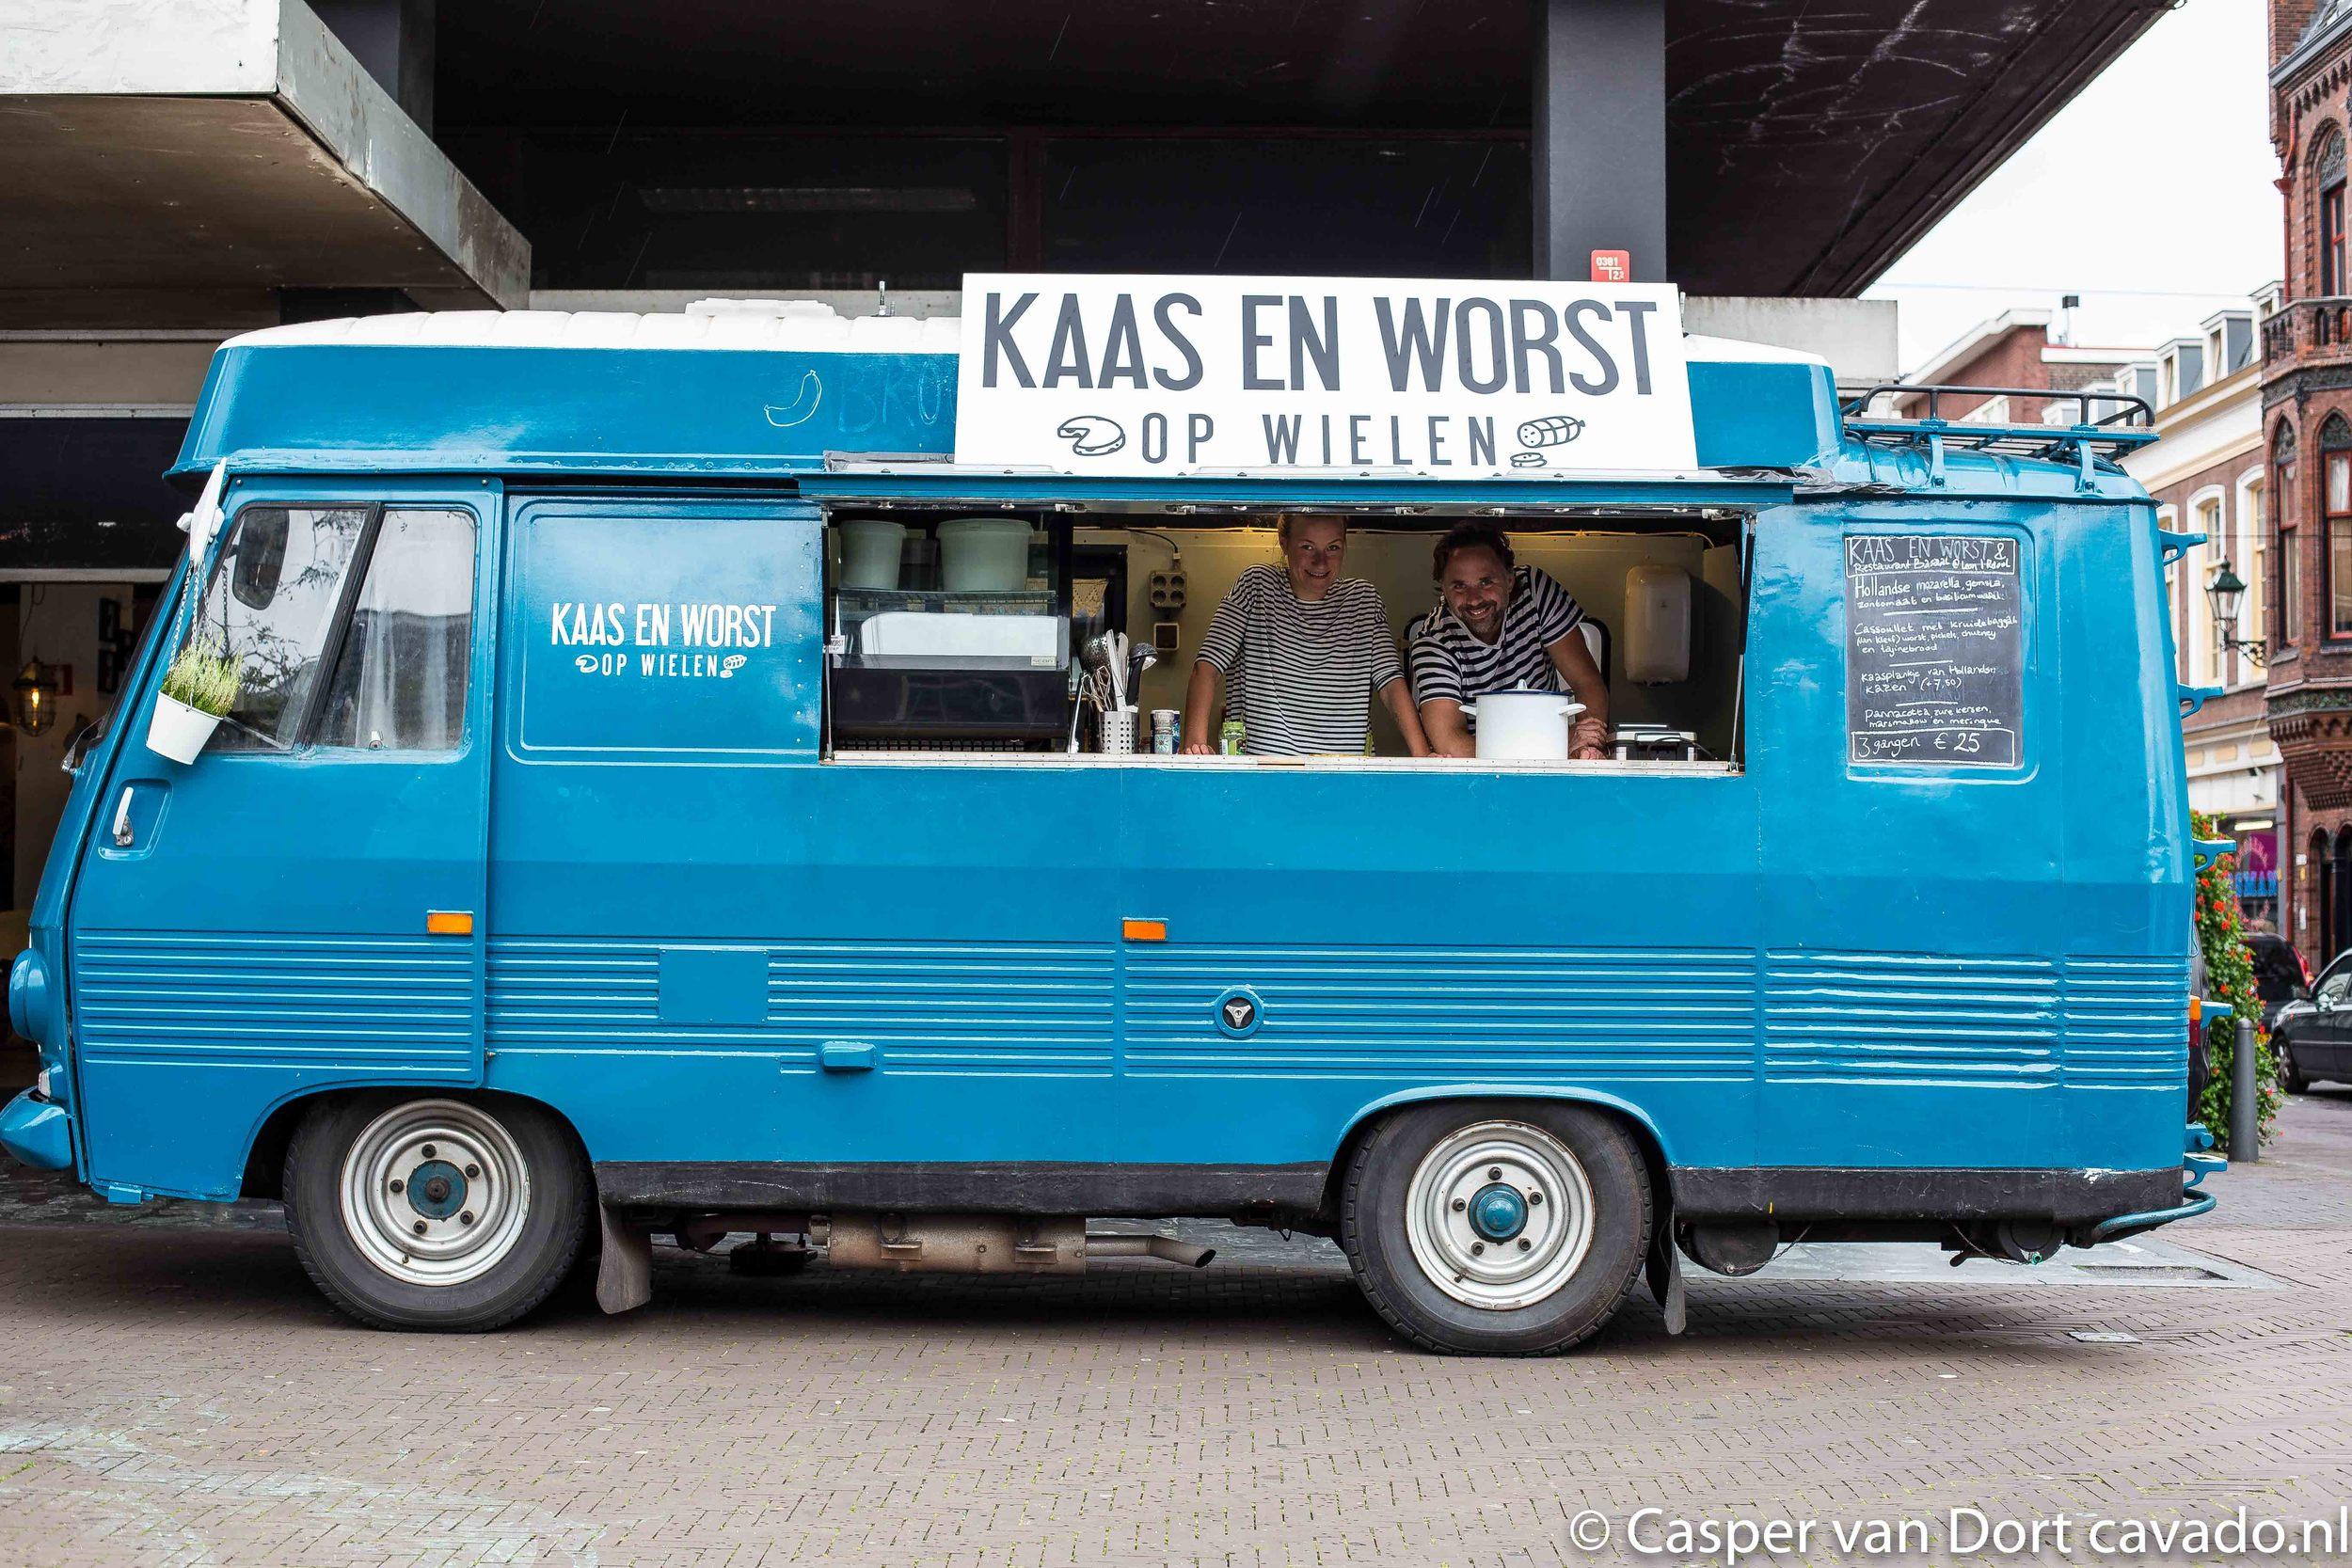 Foodtruck Kaas & Worst op wielen